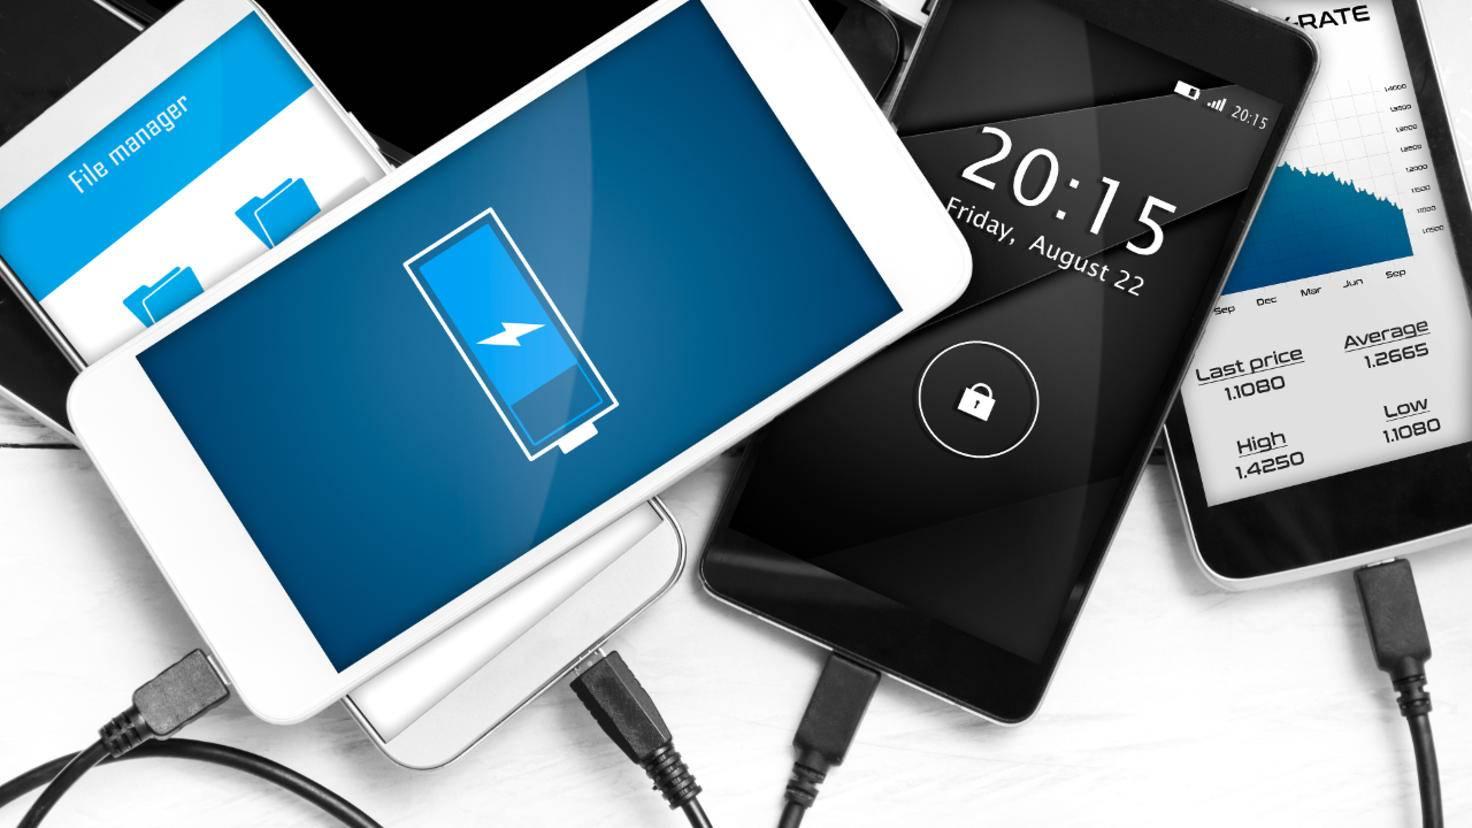 iPhone-Akku-tauschen